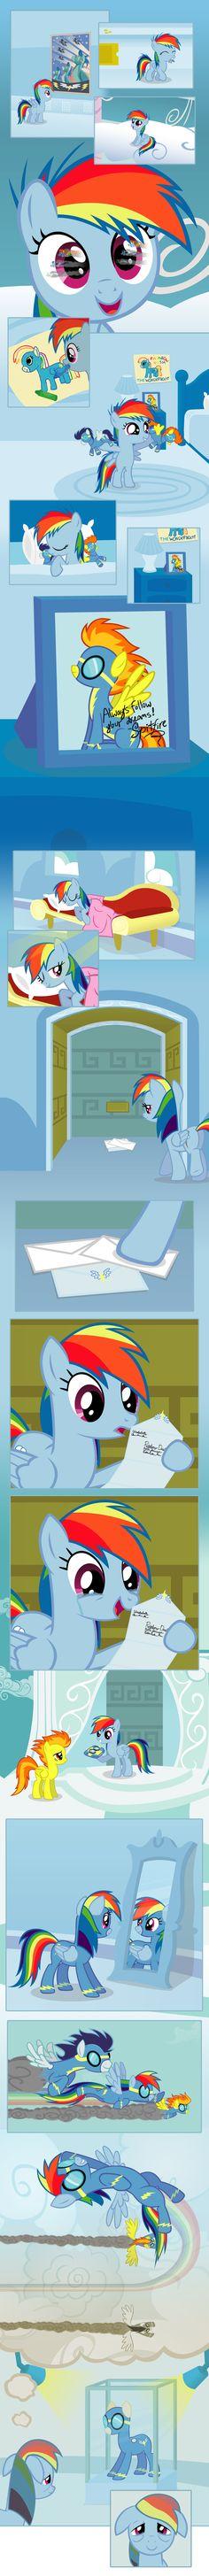 Rainbow Dash's dream.